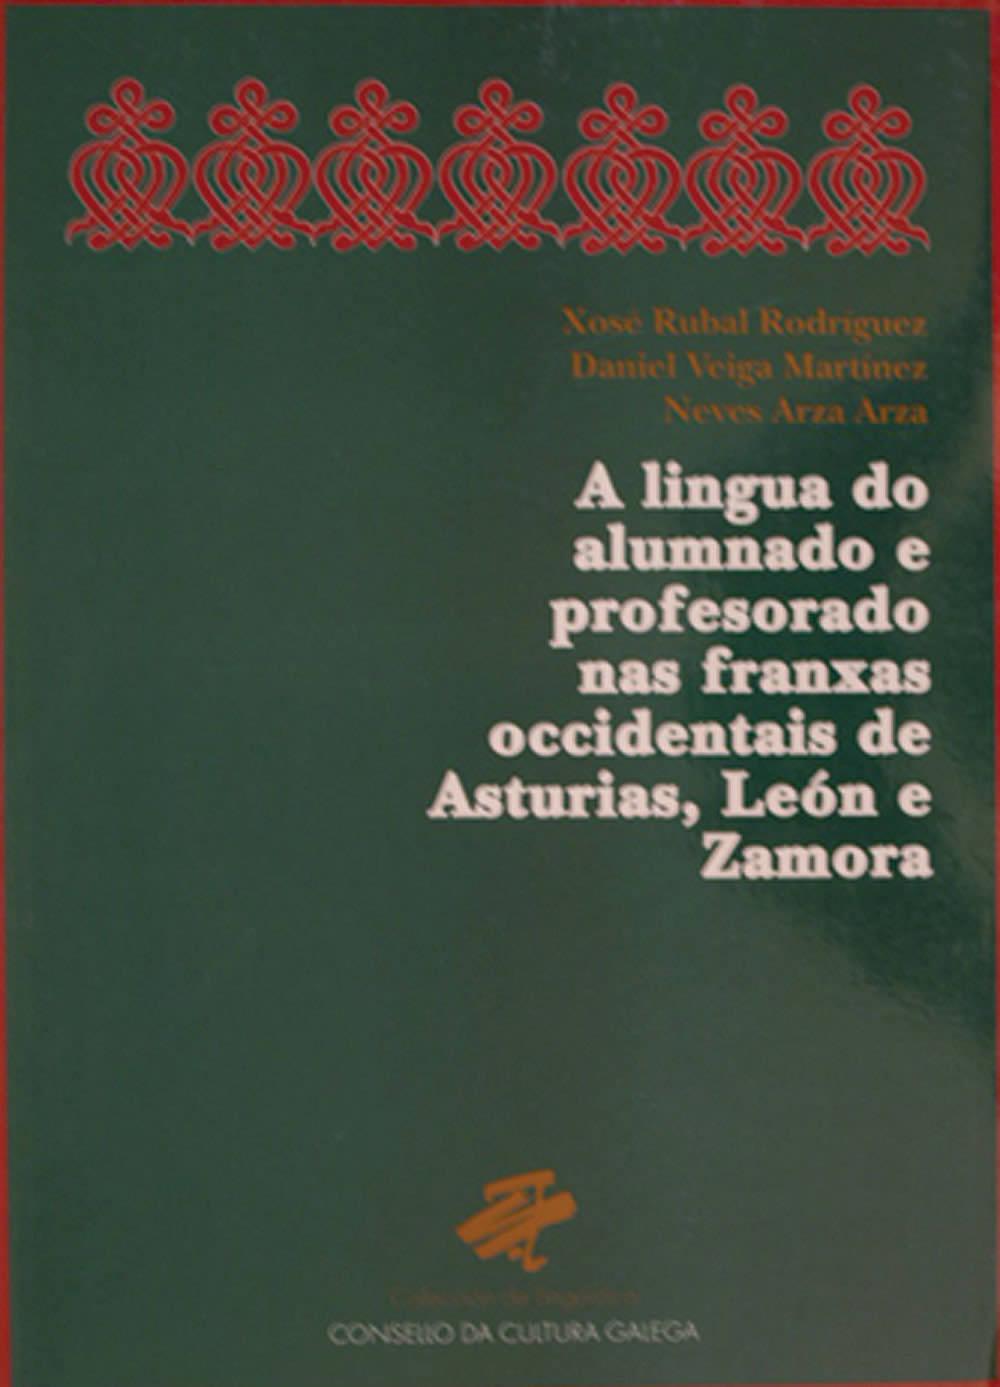 Portada de A lingua do alumnado e do profesorado nas franxas occidentais de Asturias, León e Zamora